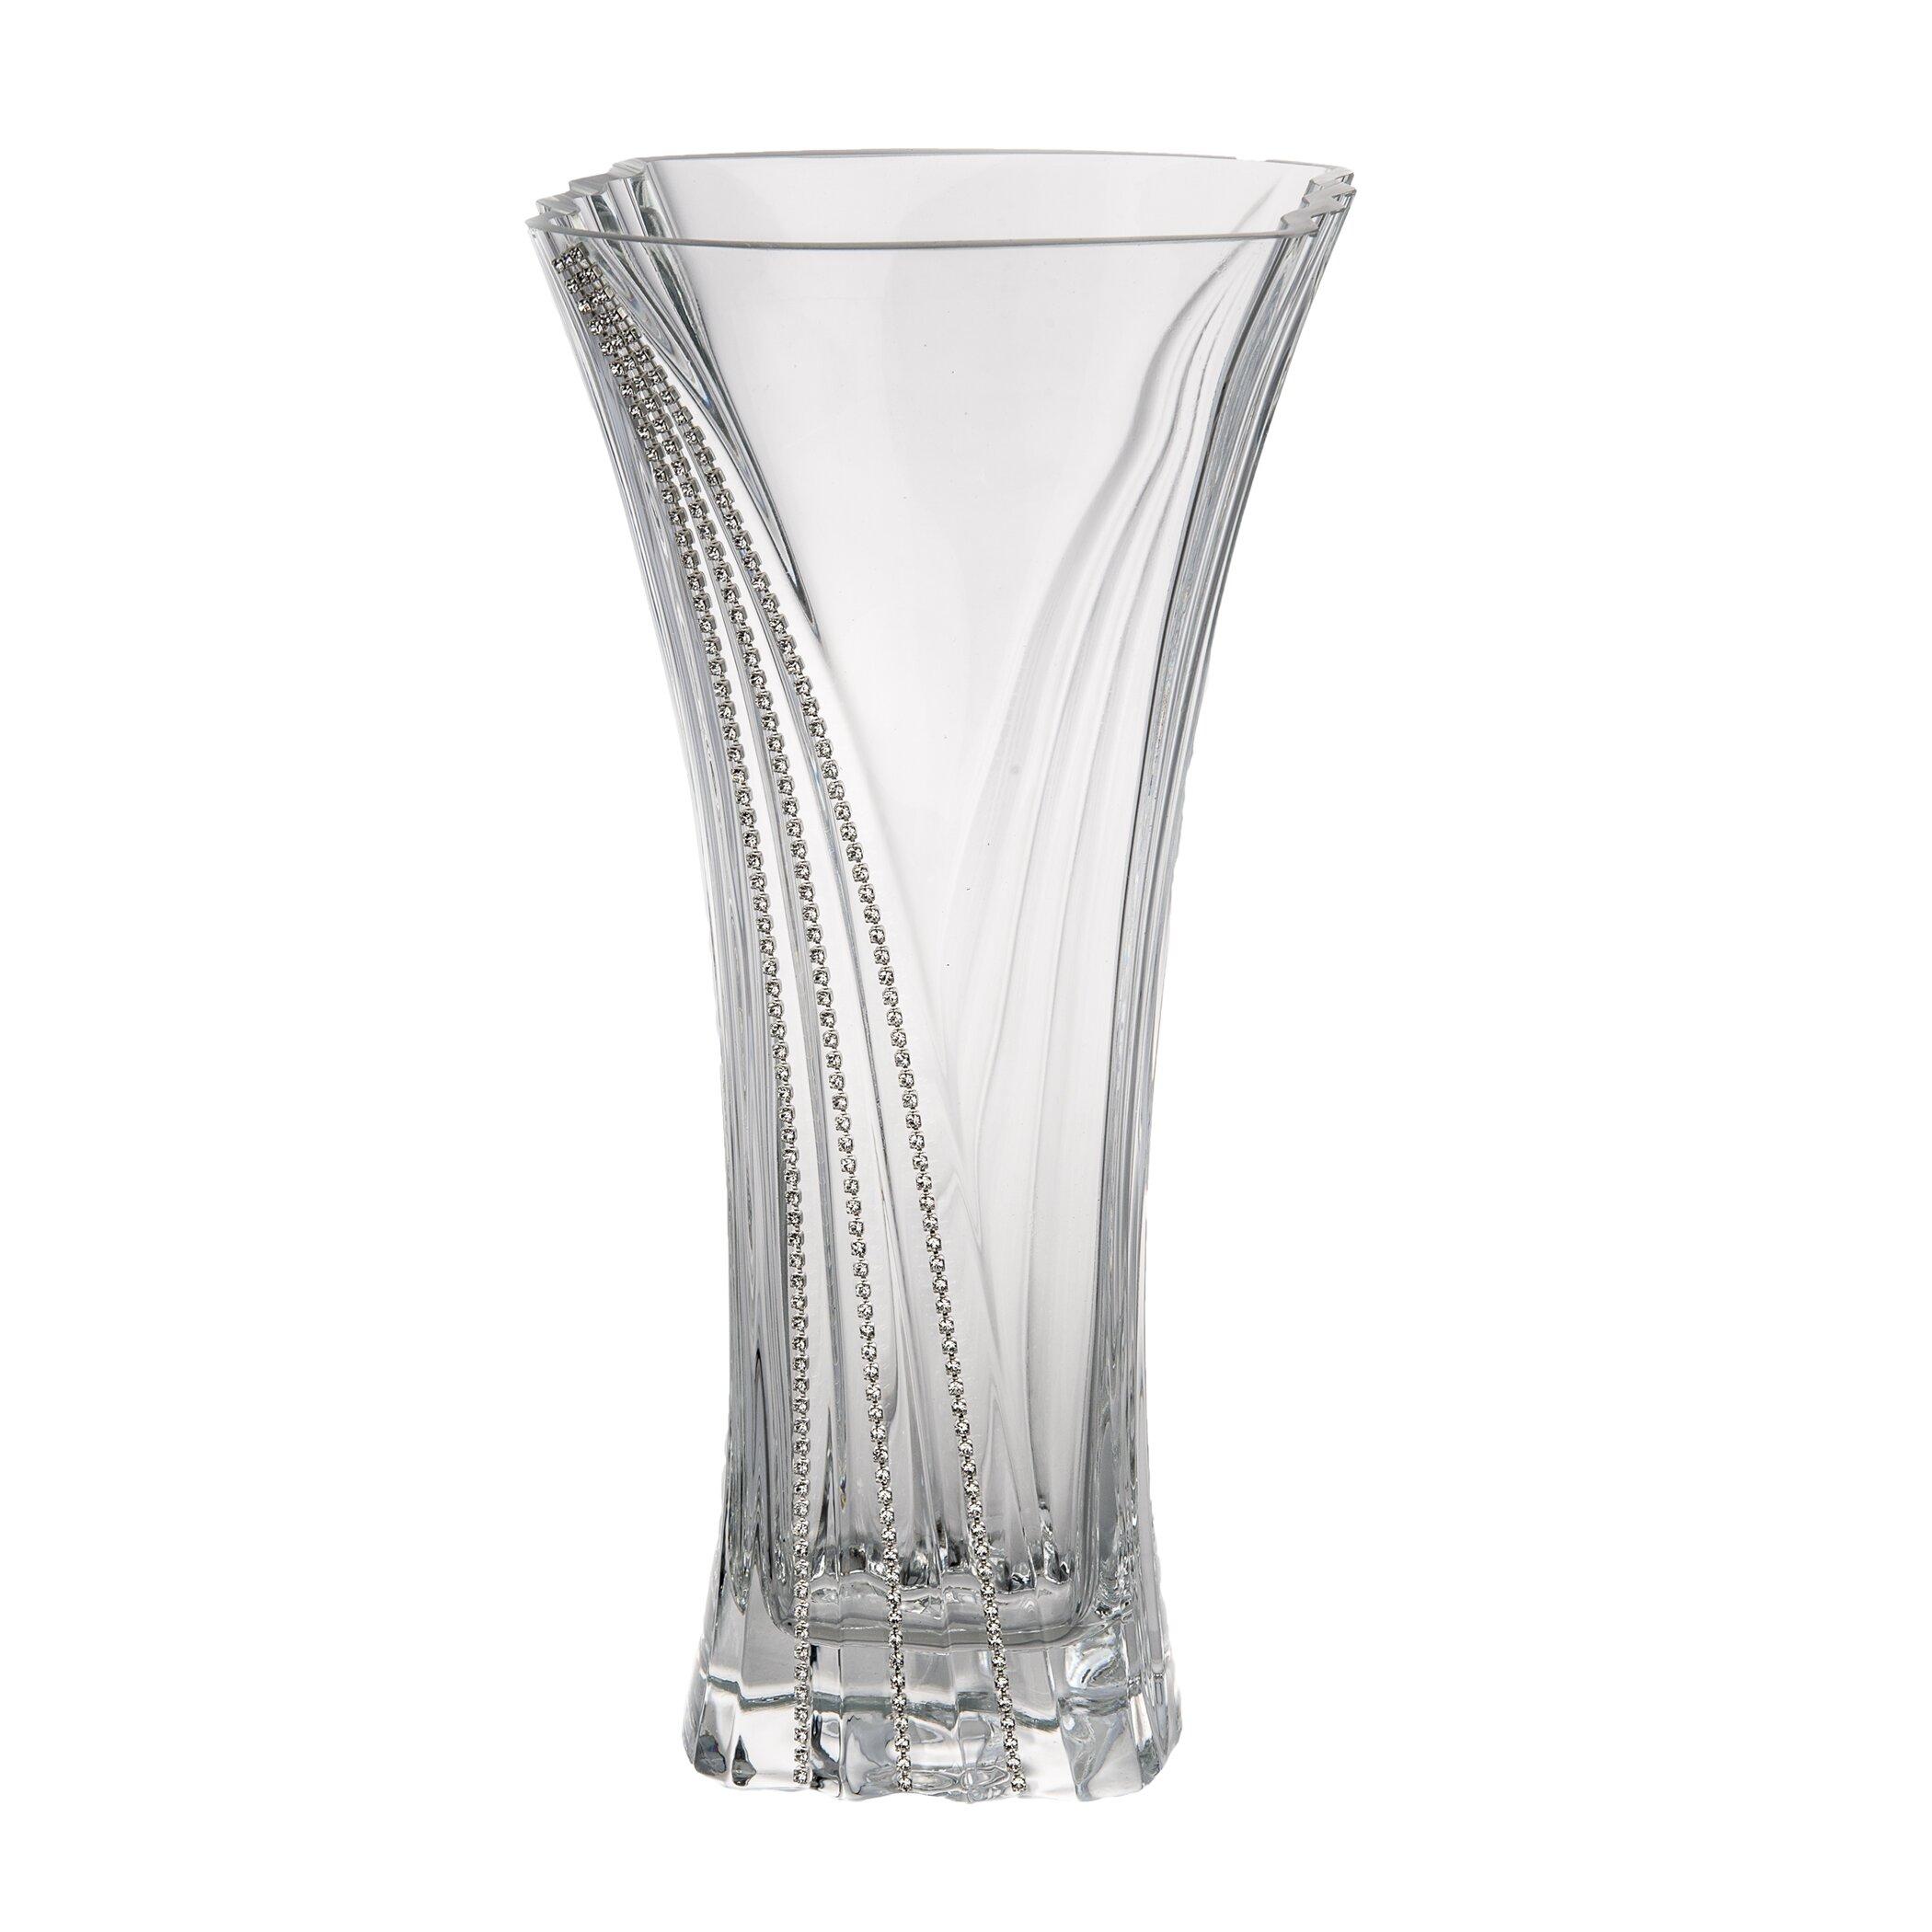 ClassicTouch Wavy Swarovski Crystal Vase : Wayfair